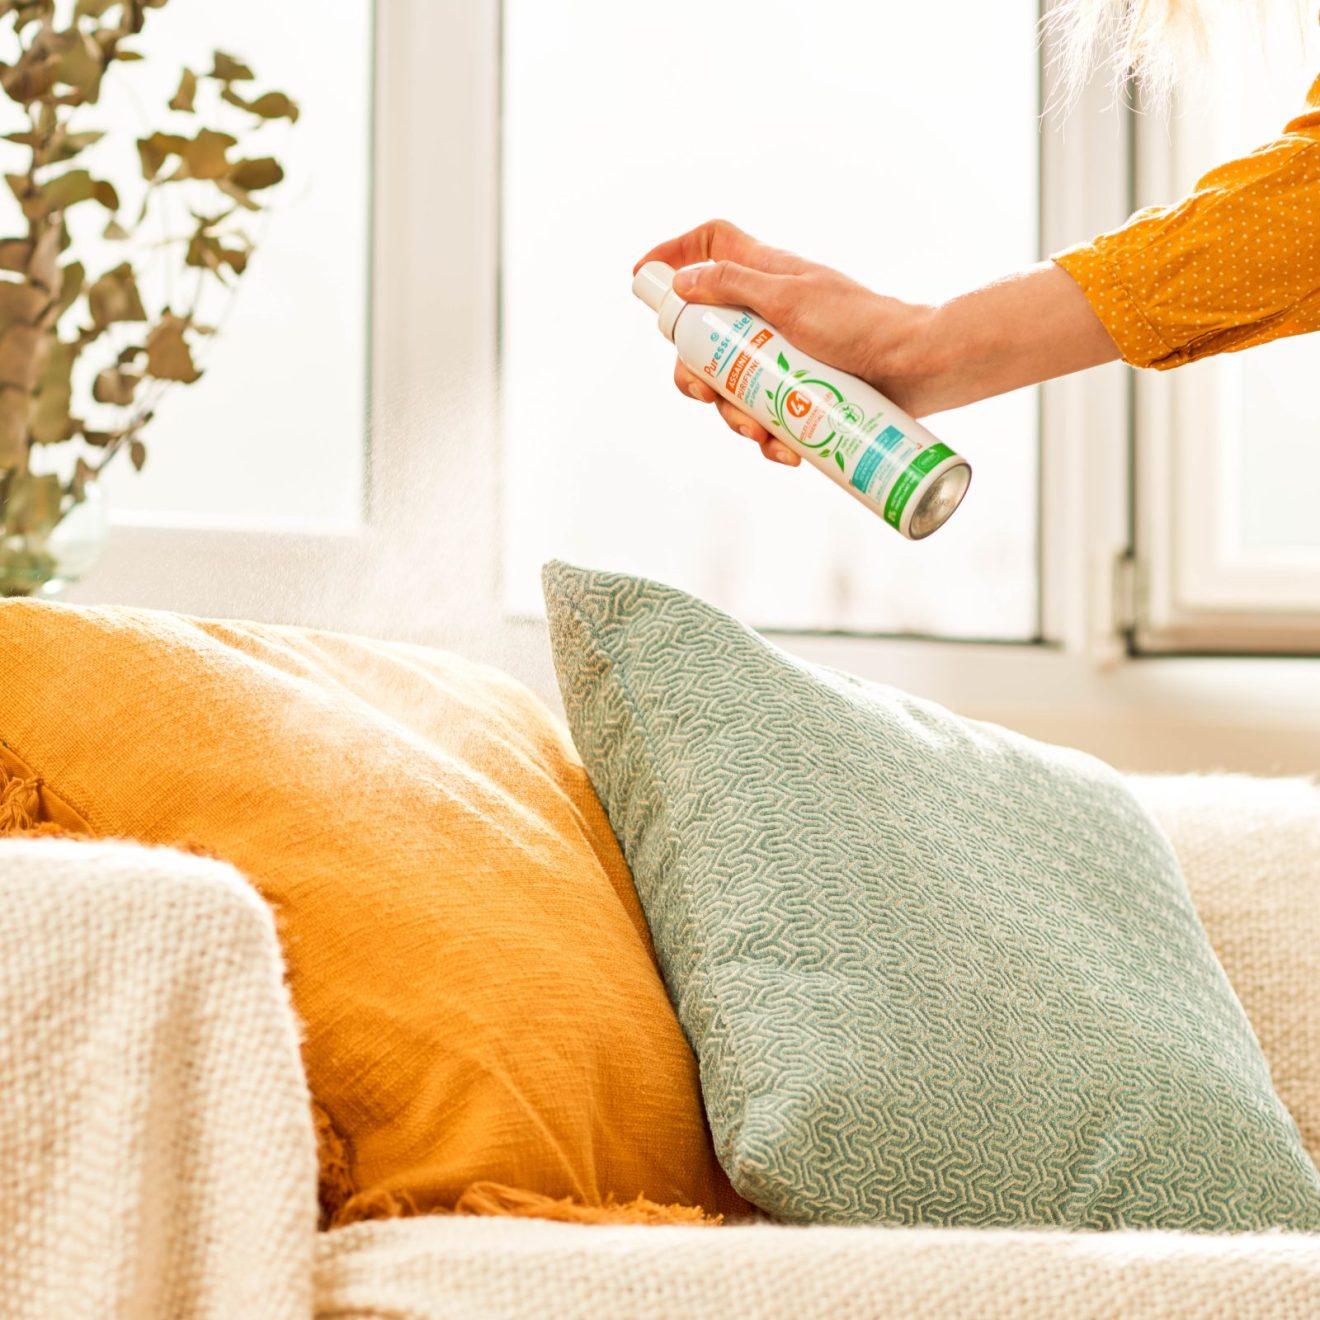 Puressentiel purifying spray